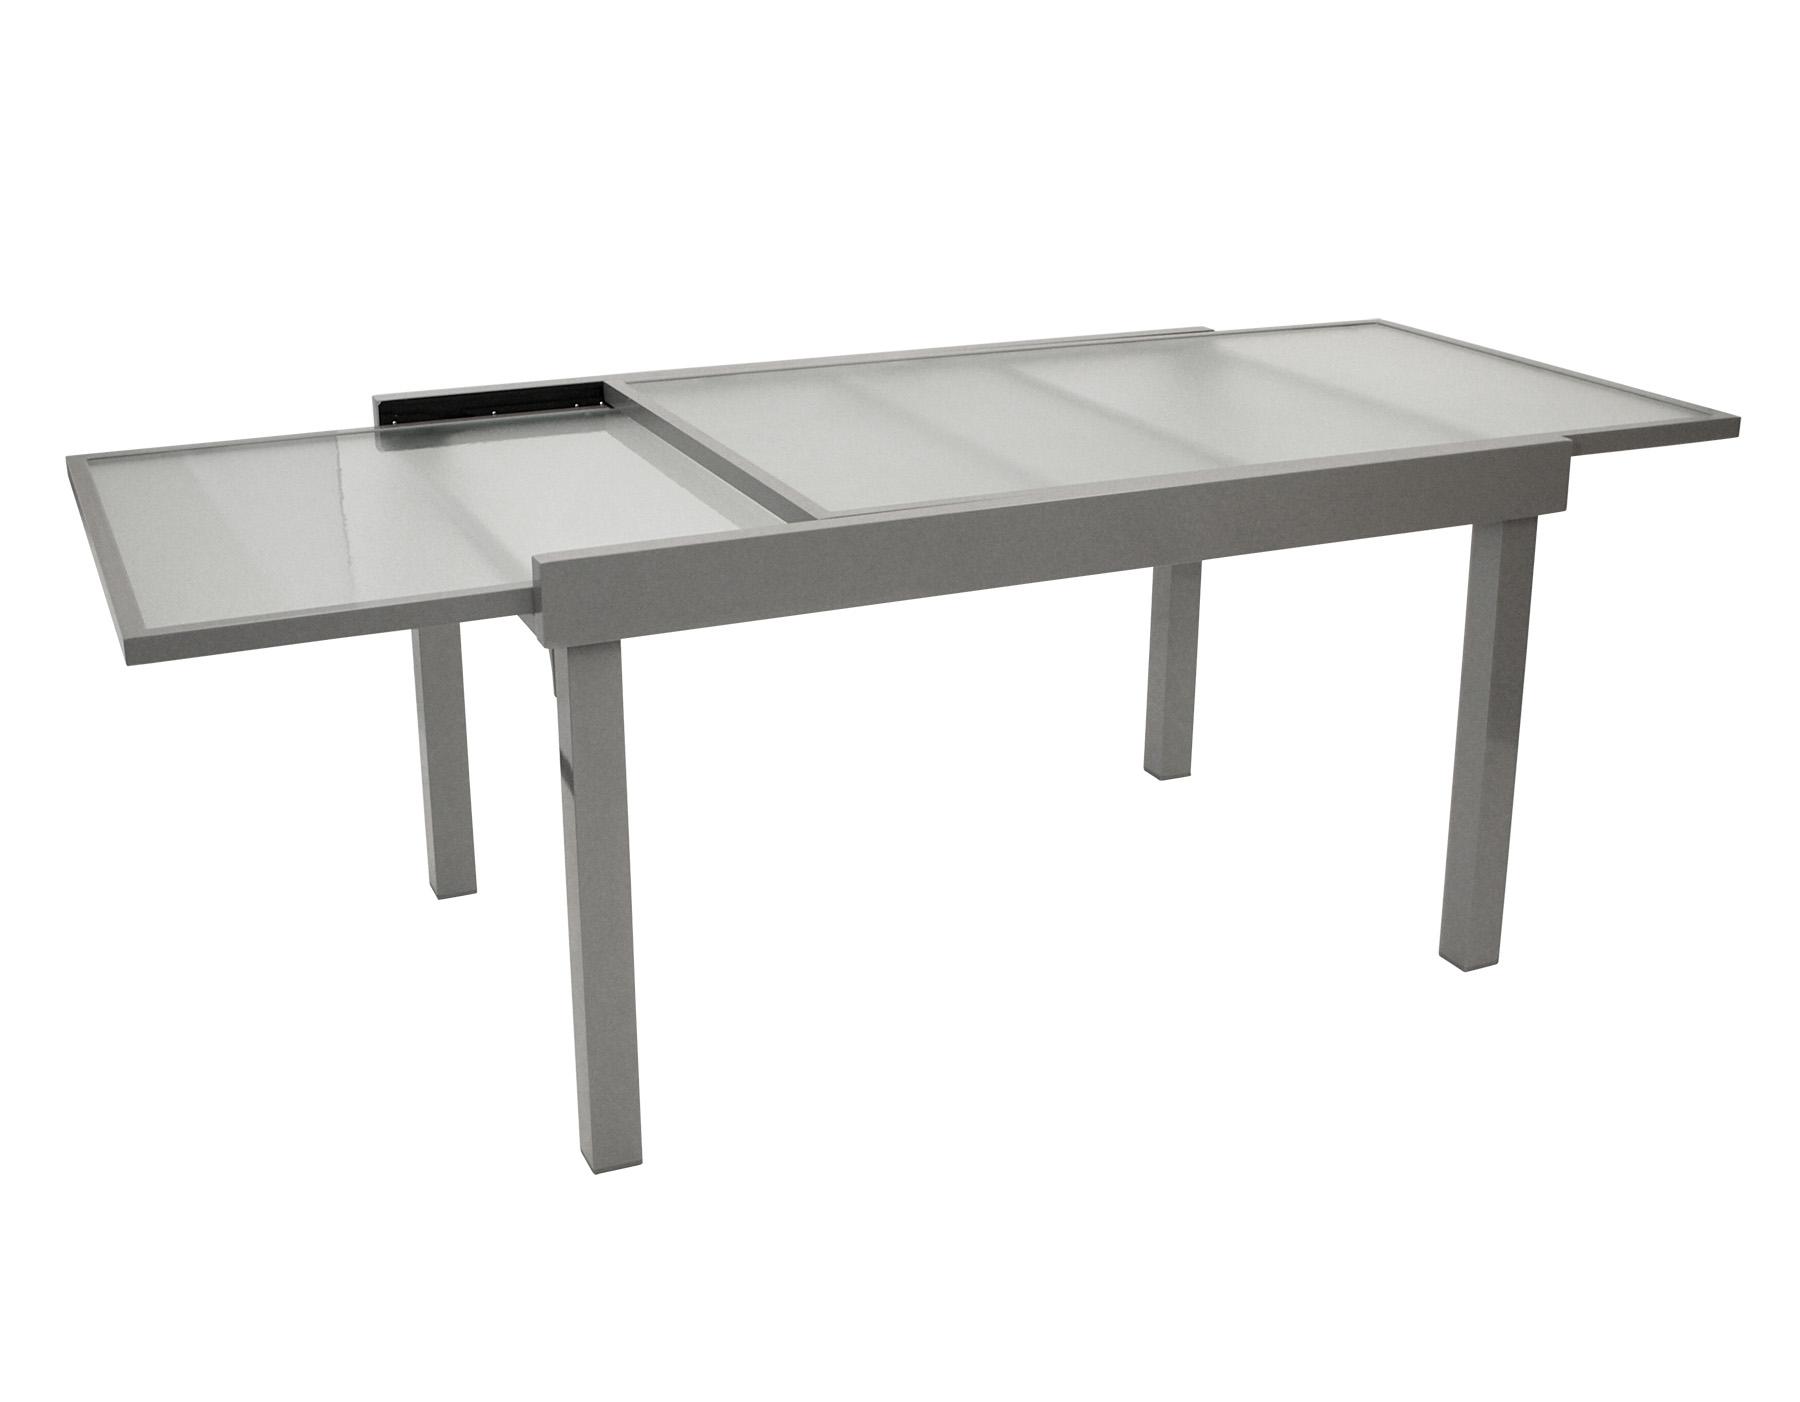 Schon Ausziehtisch AMALFI 135/270x90cm, Aluminium + Glas